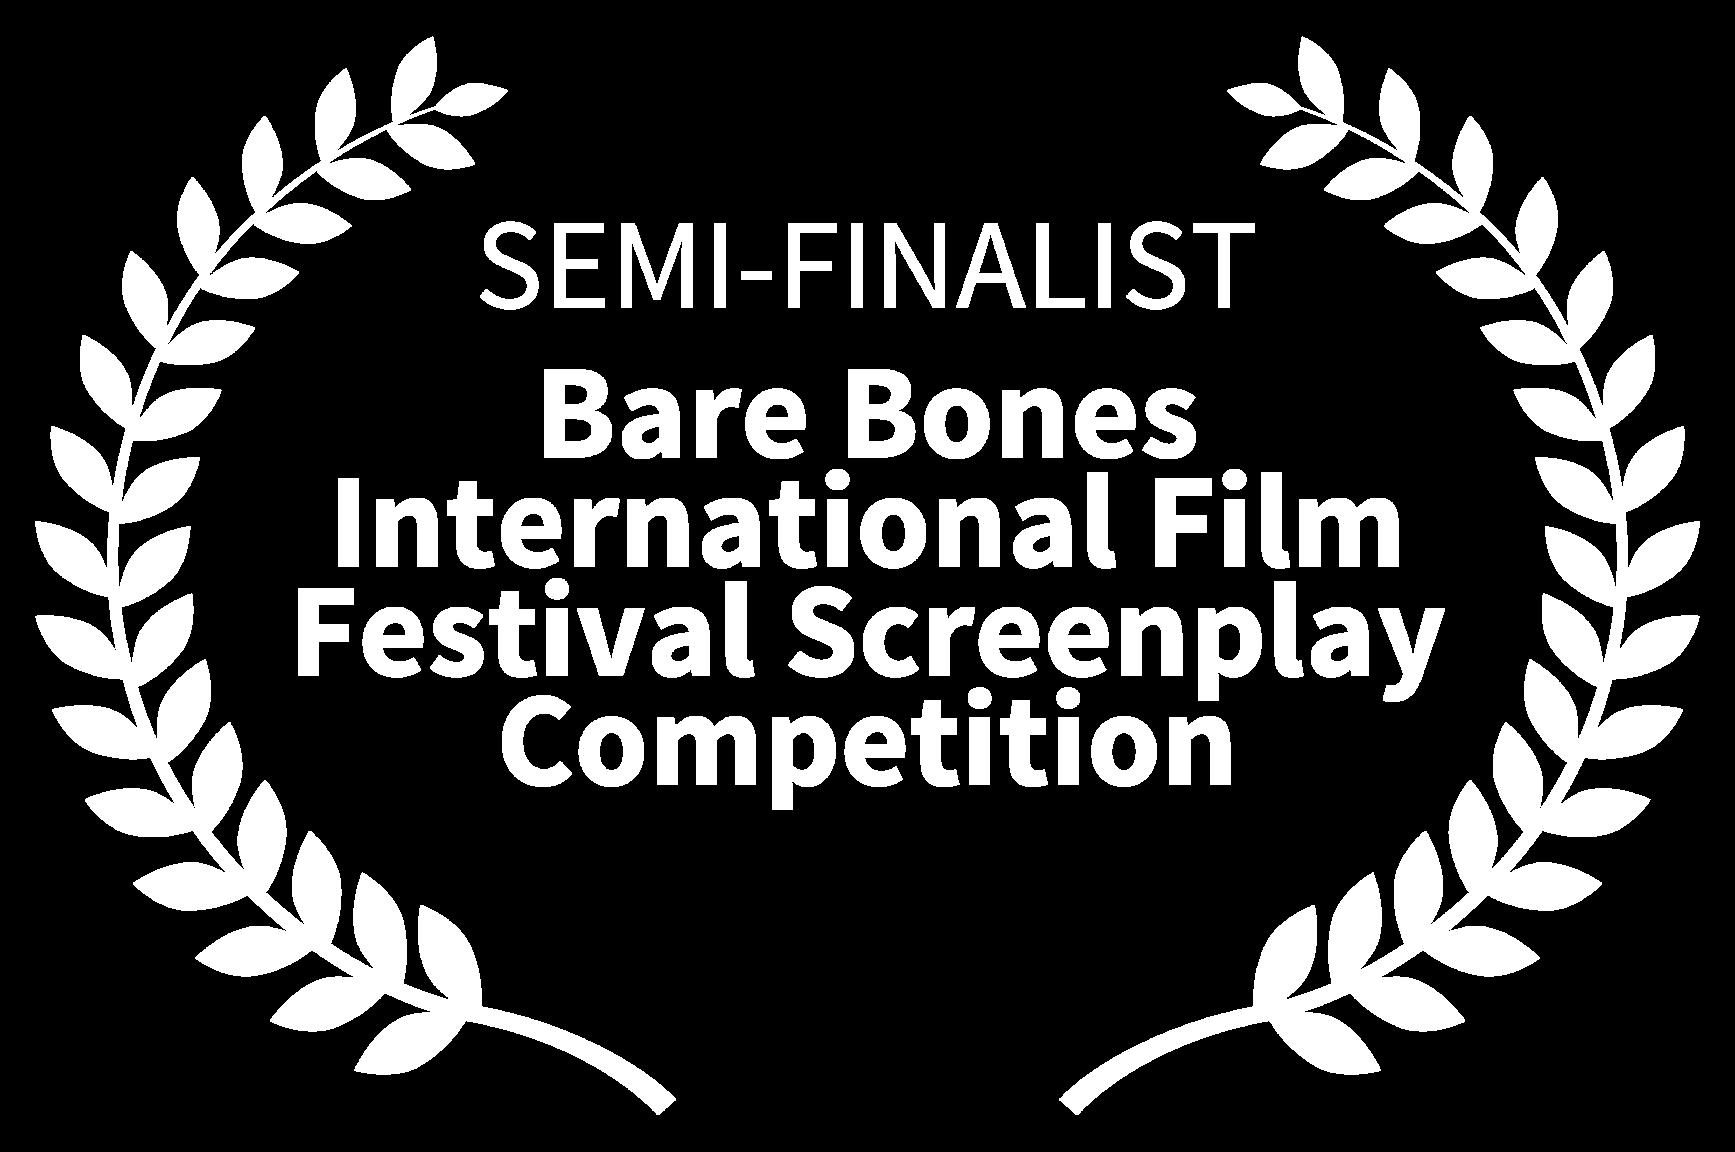 SEMI-FINALIST - Bare Bones International Film Festival Screenplay Competition